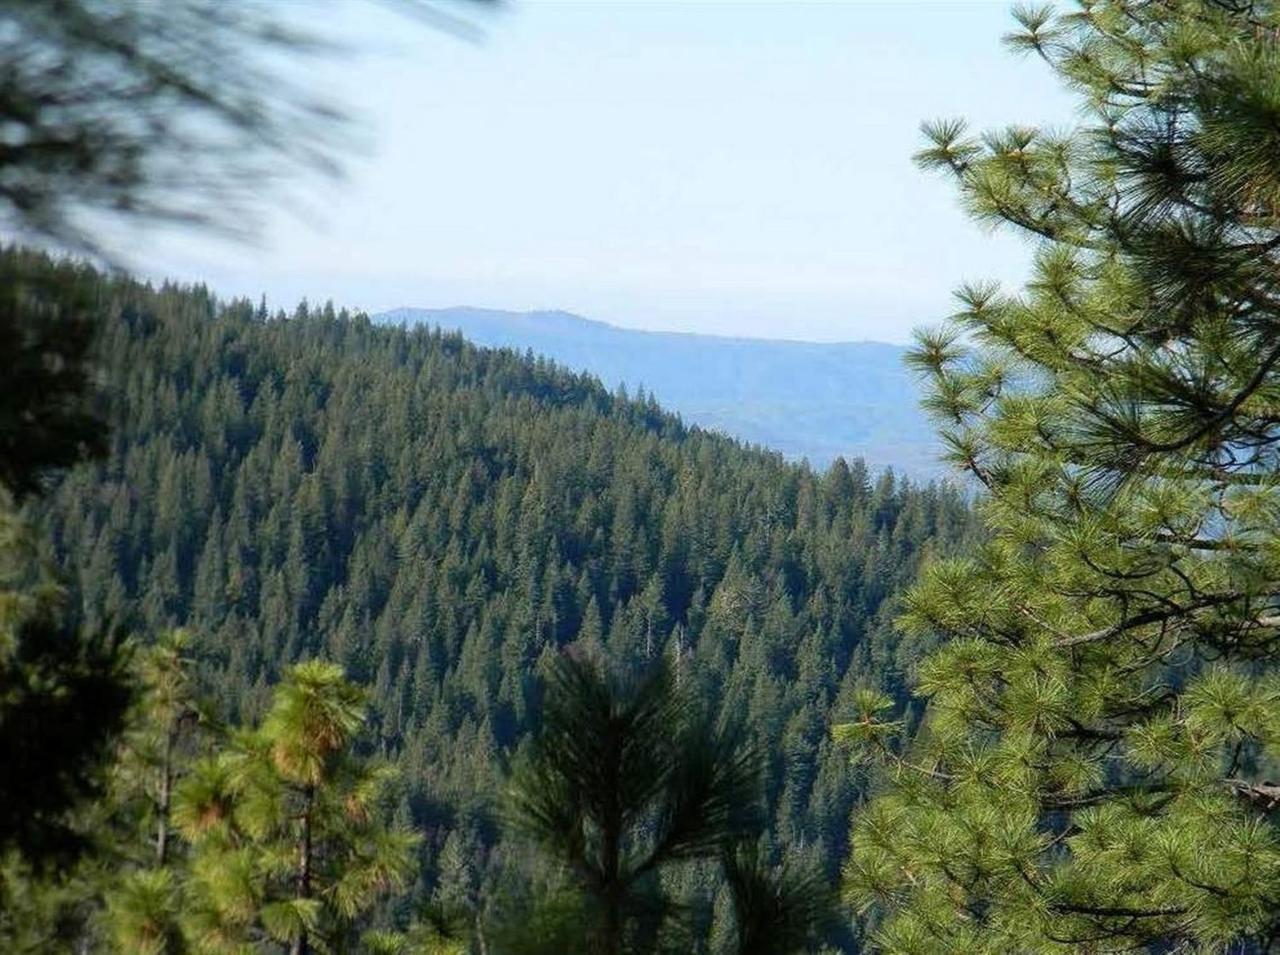 7487 Yosemite Park Way - Photo 1